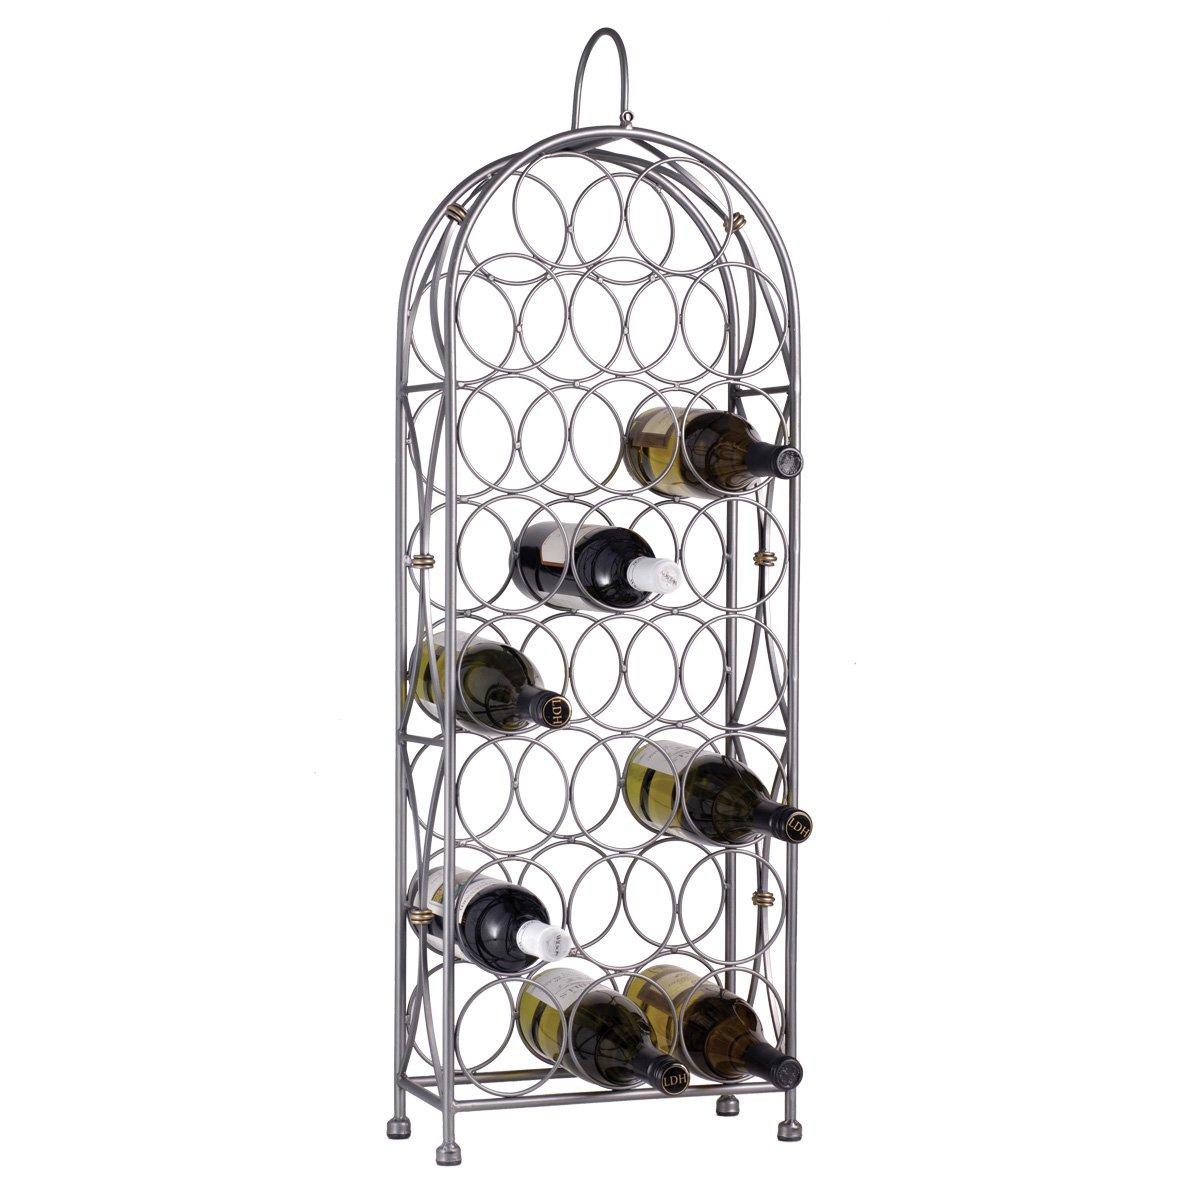 Oenophilia Bordeaux Chateau Wine Rack- 23 Bottle by Oenophilia